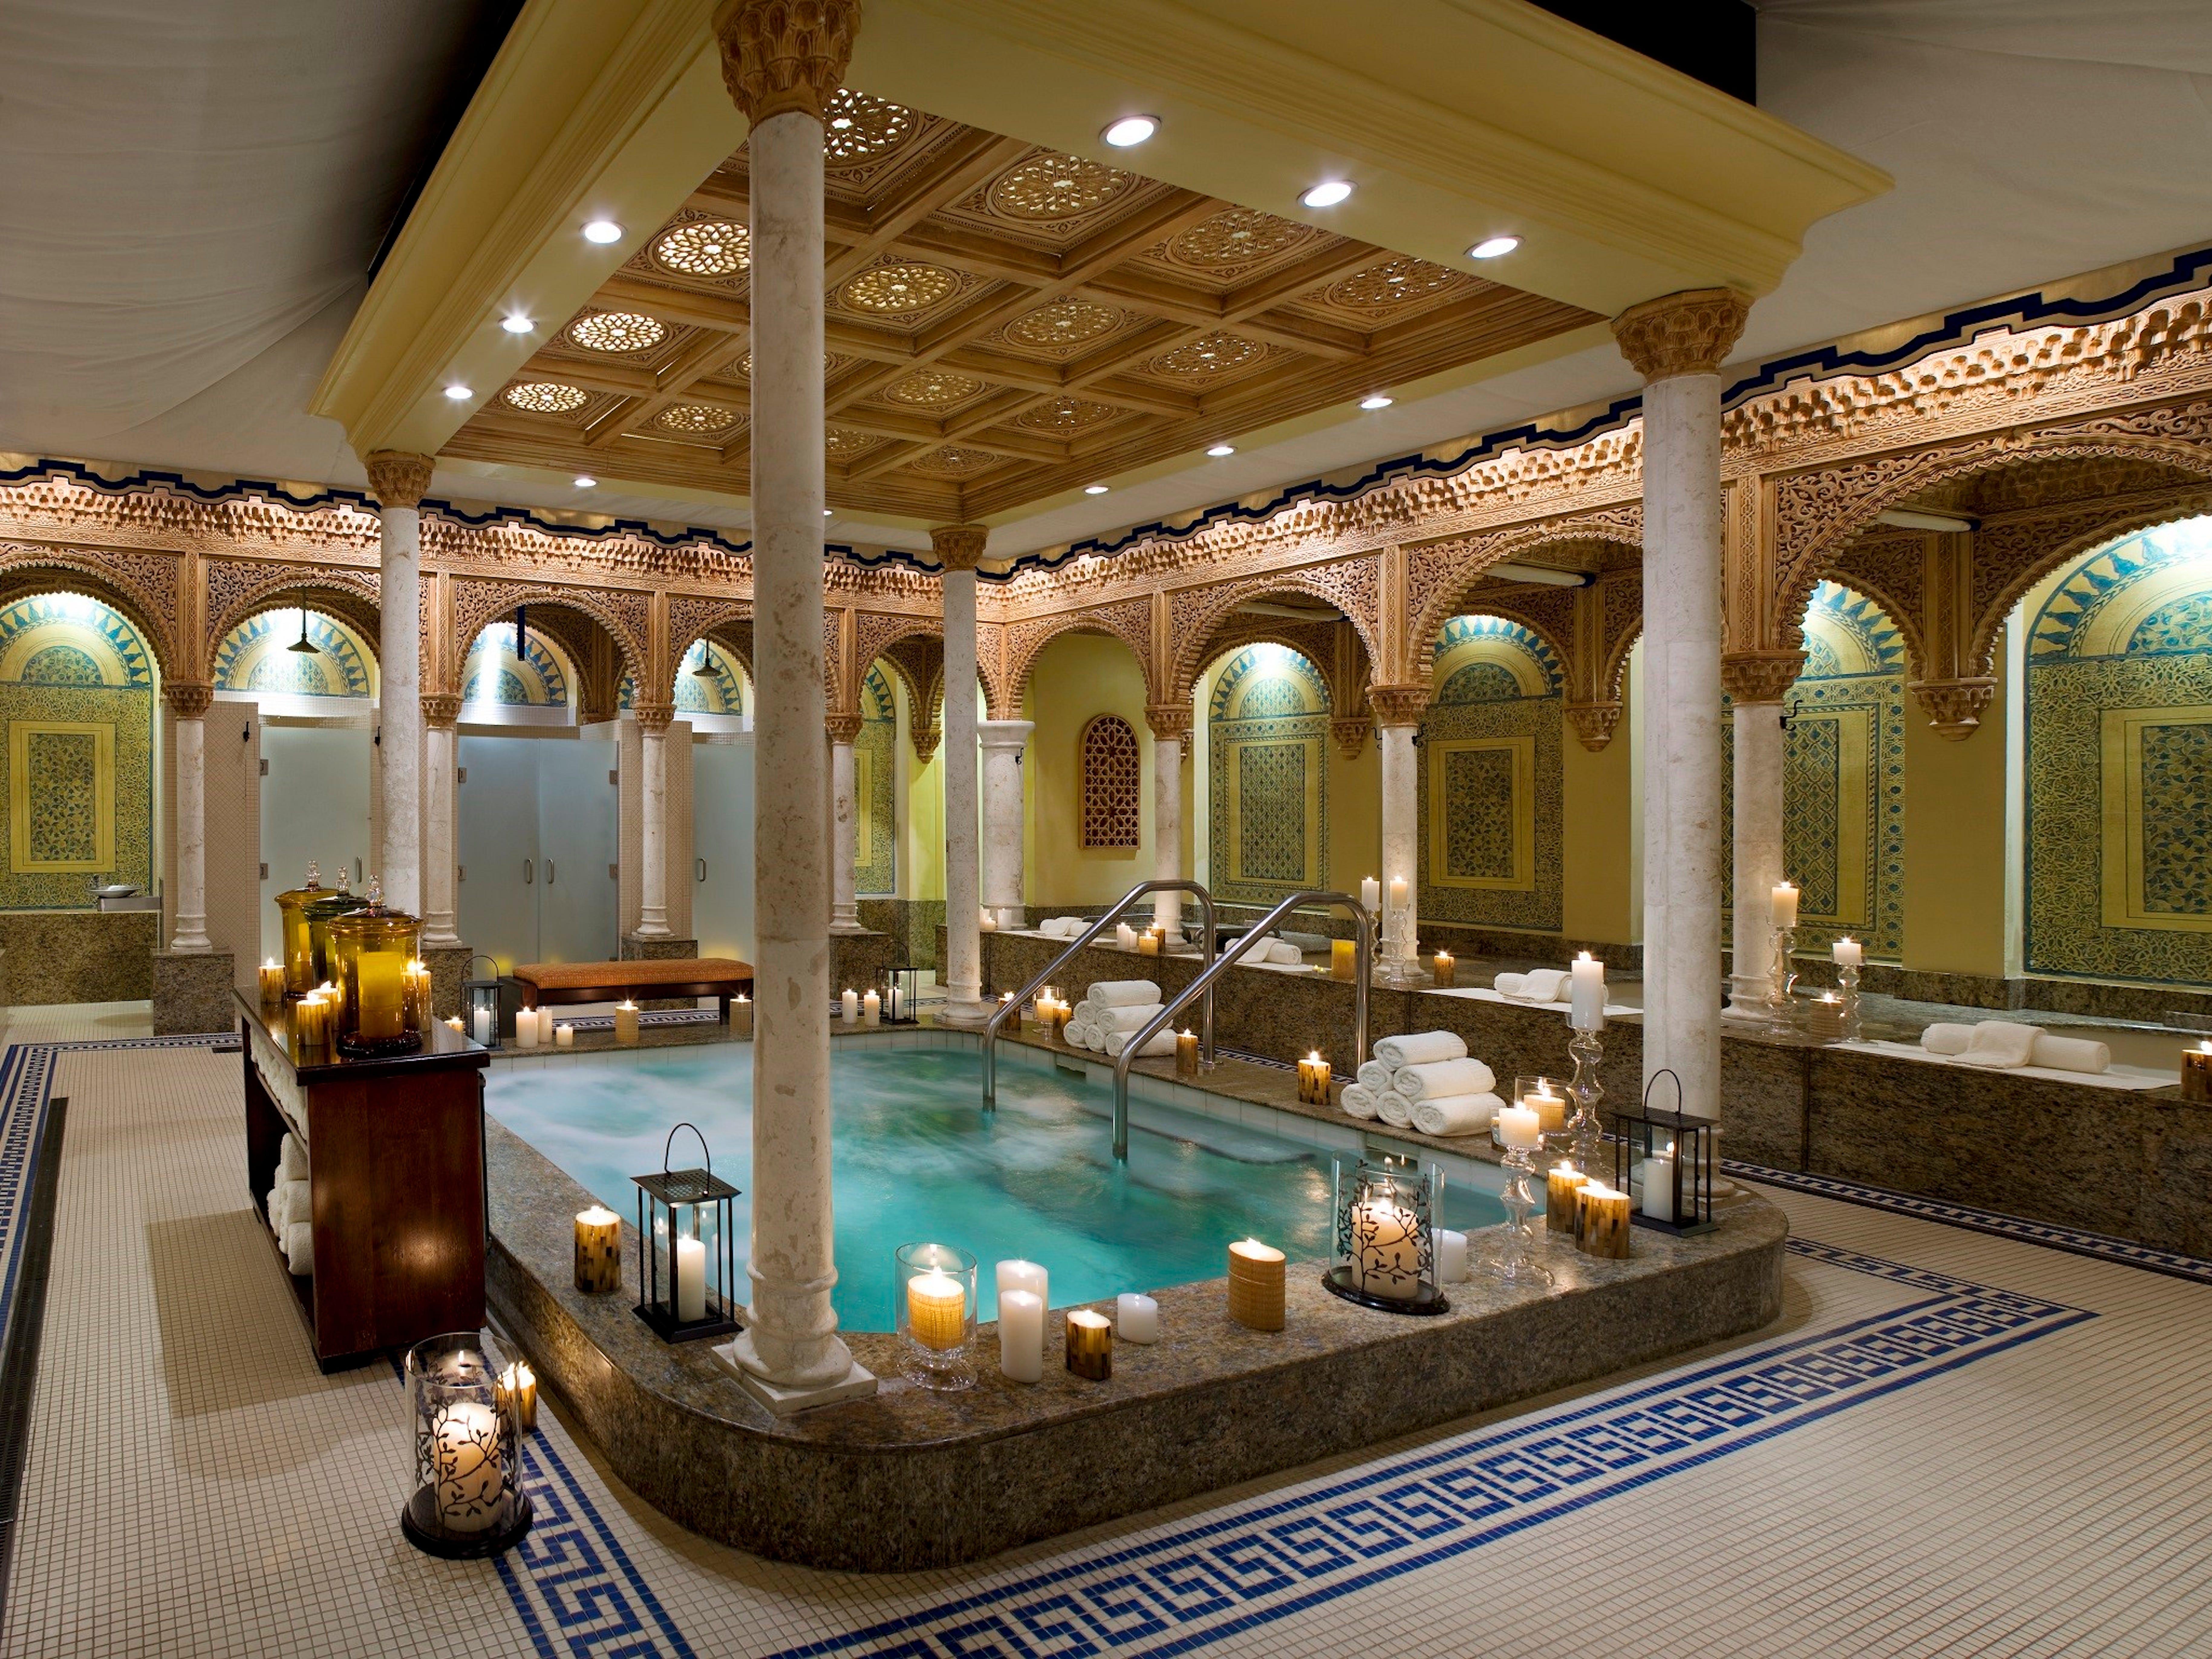 Enjoy a Ritual Bath in this stunning space at Waldorf Astoria Spa.